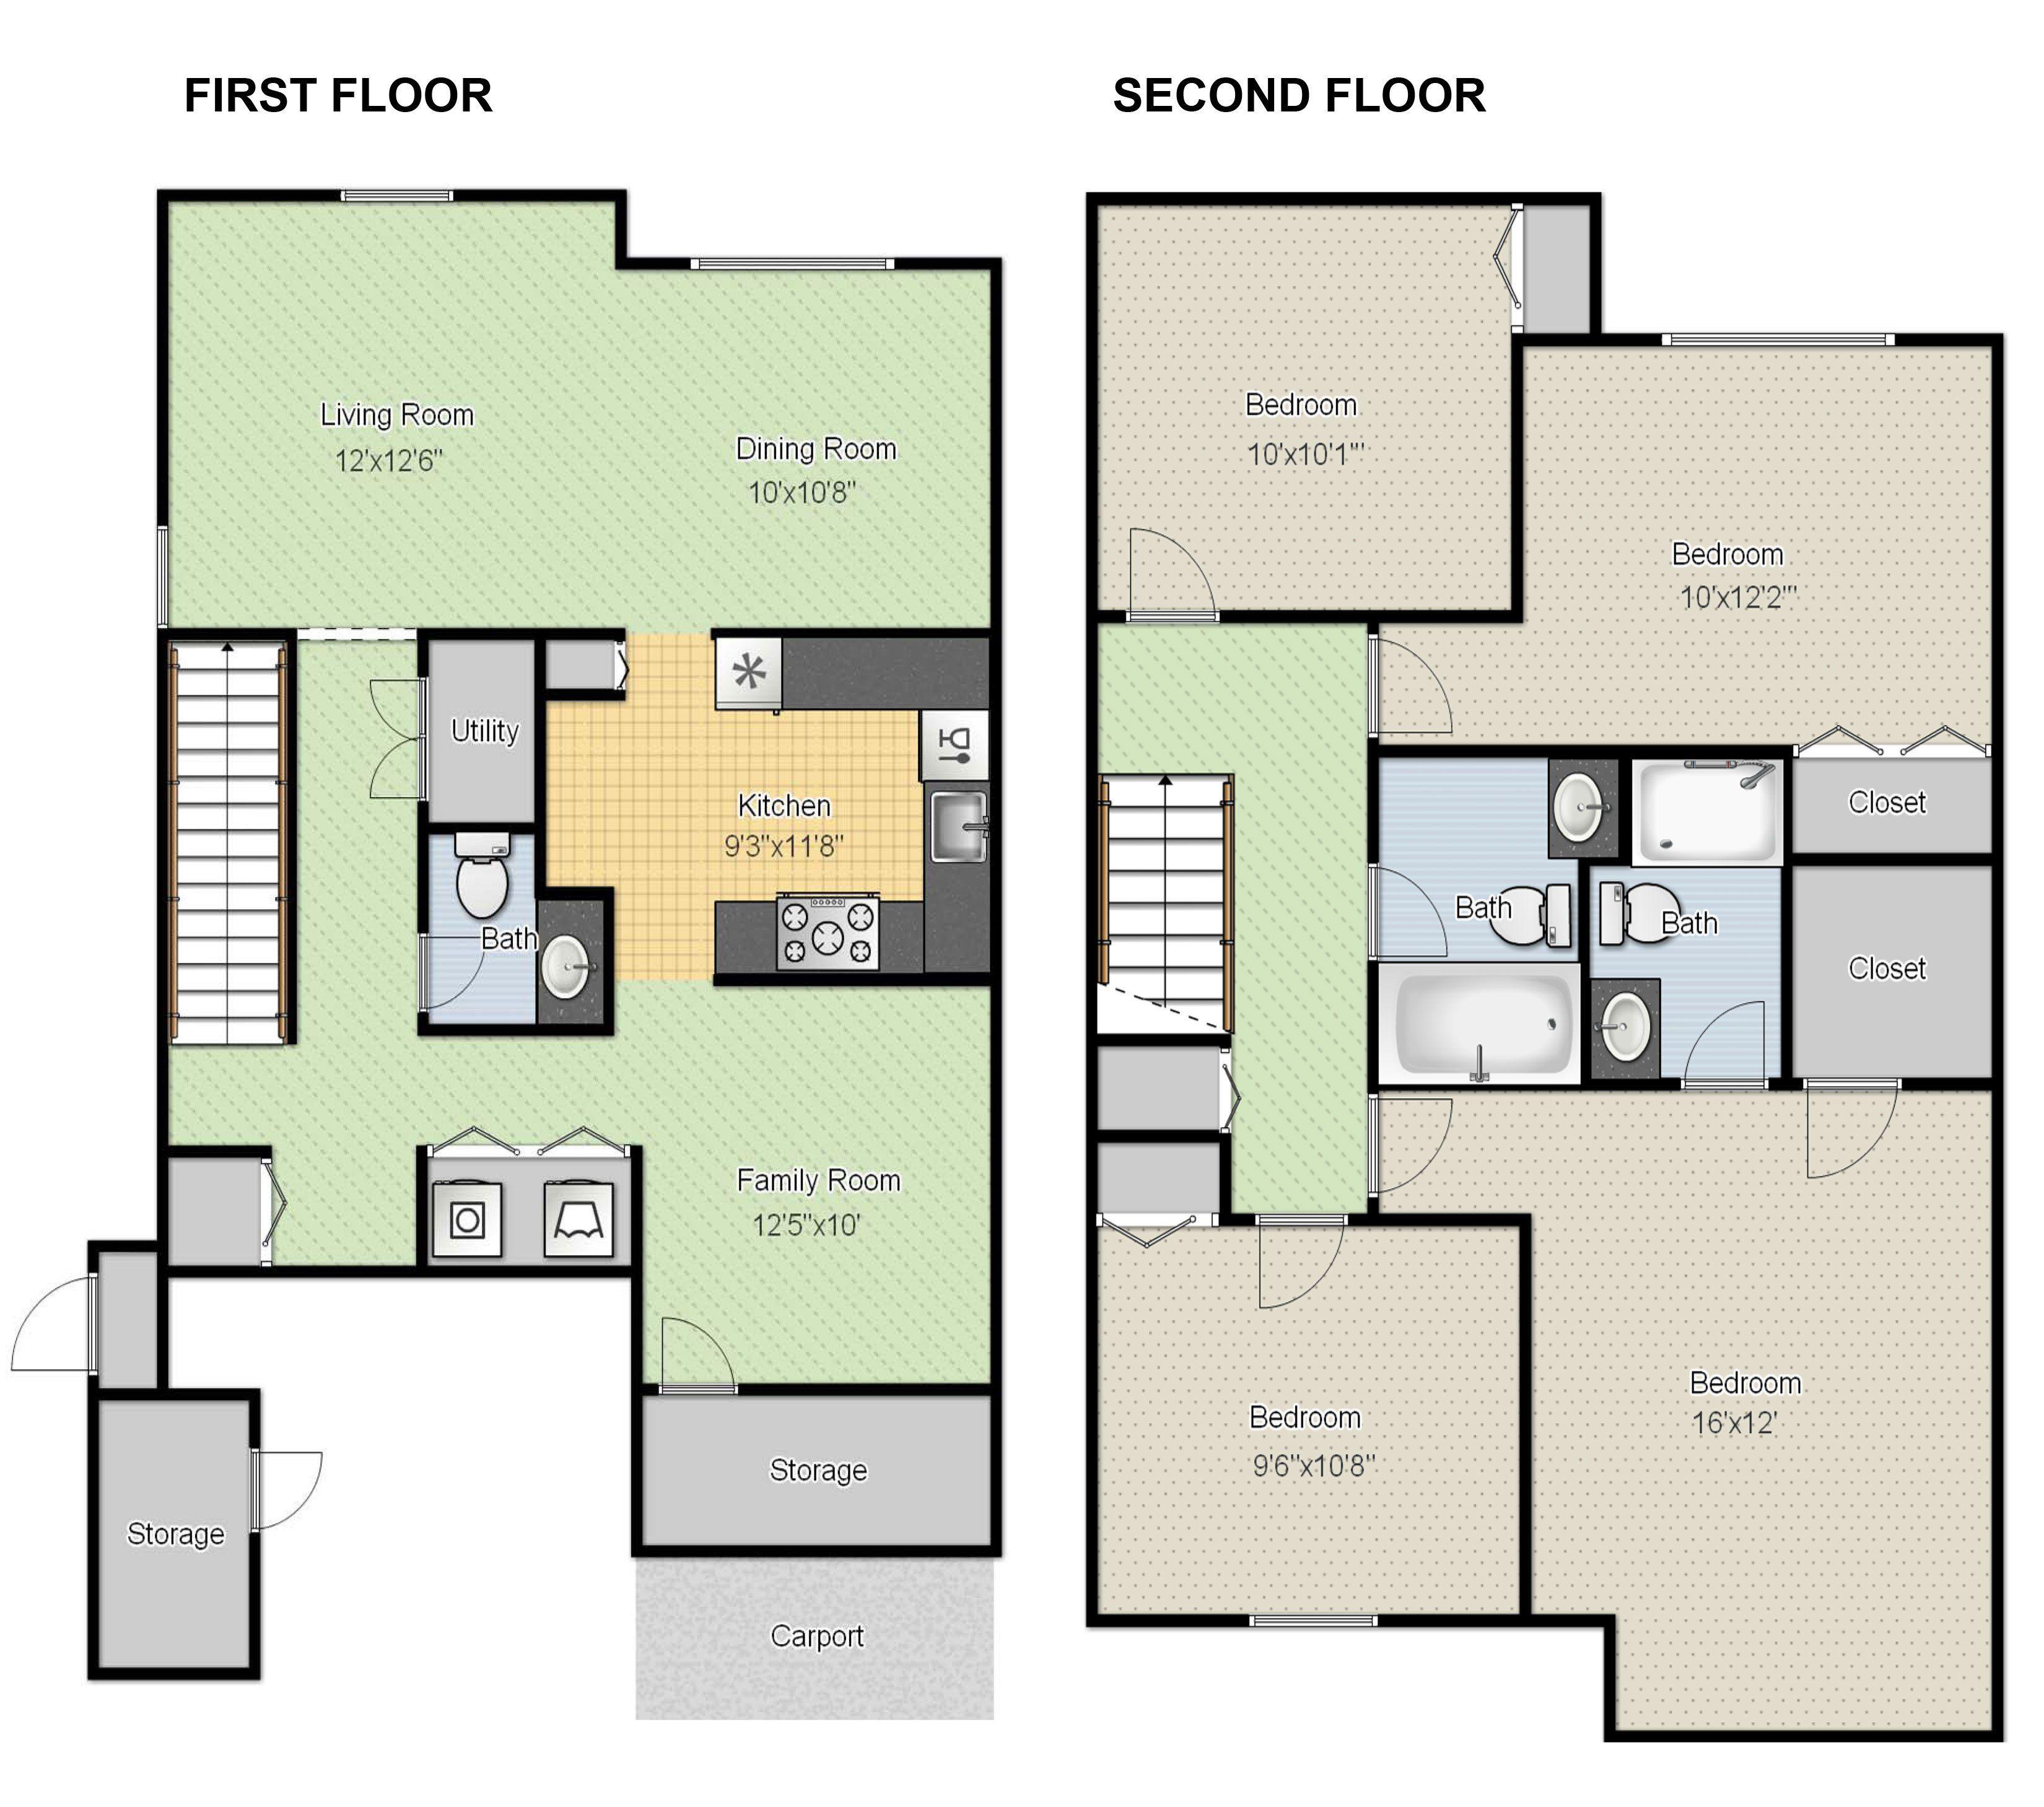 Interior room design floor plan designer online freeware bathroom small ideas layout also rh pinterest